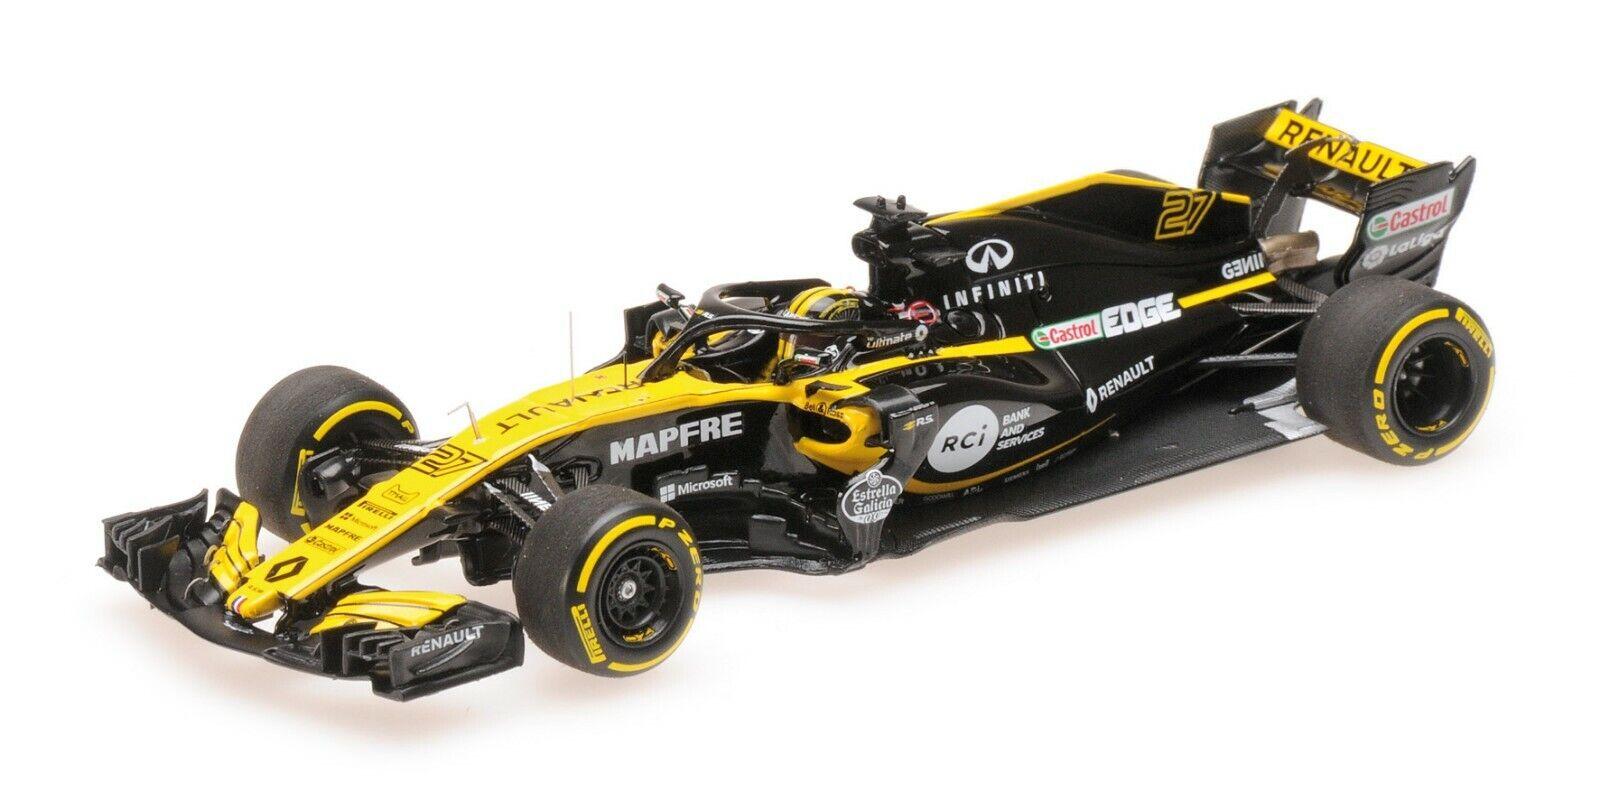 Minichamps F1 Renault R.S.18 2018 Nico Hülkenberg 1 43